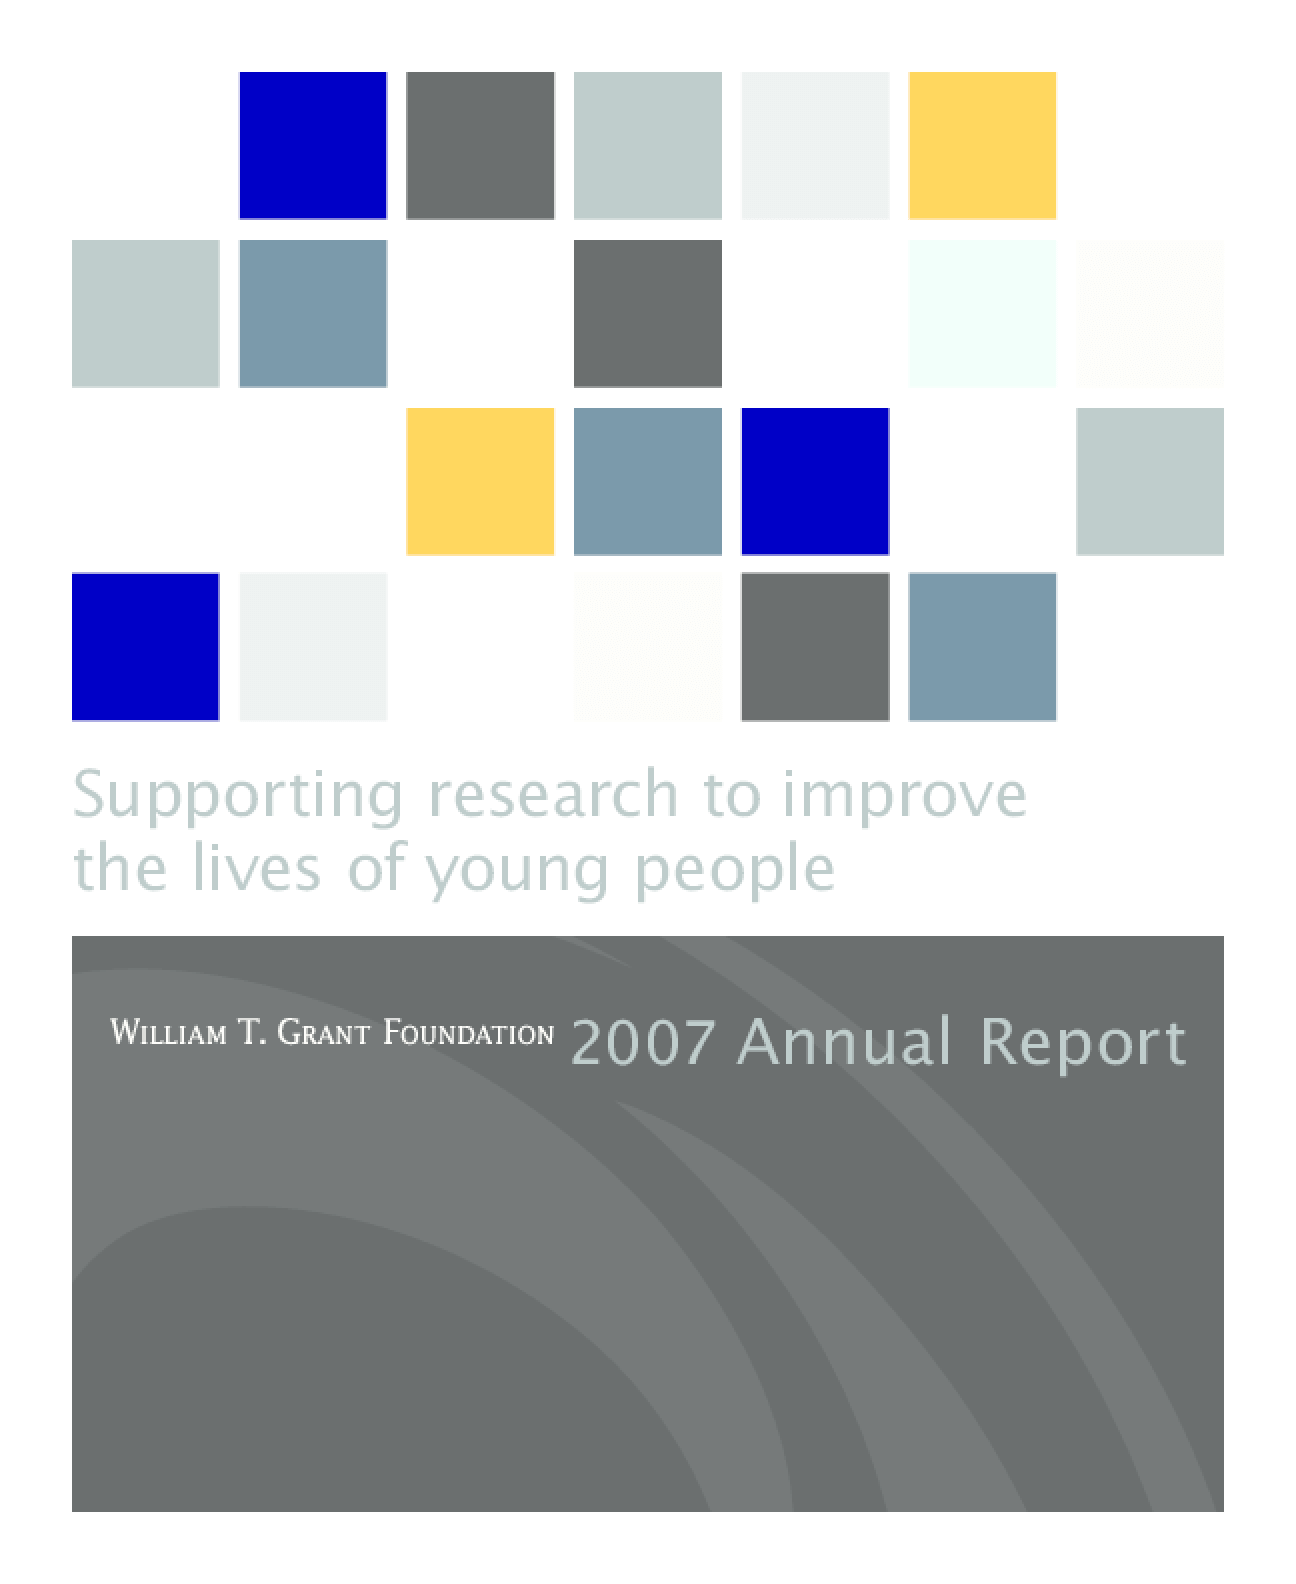 William T. Grant Foundation - 2007 Annual Report